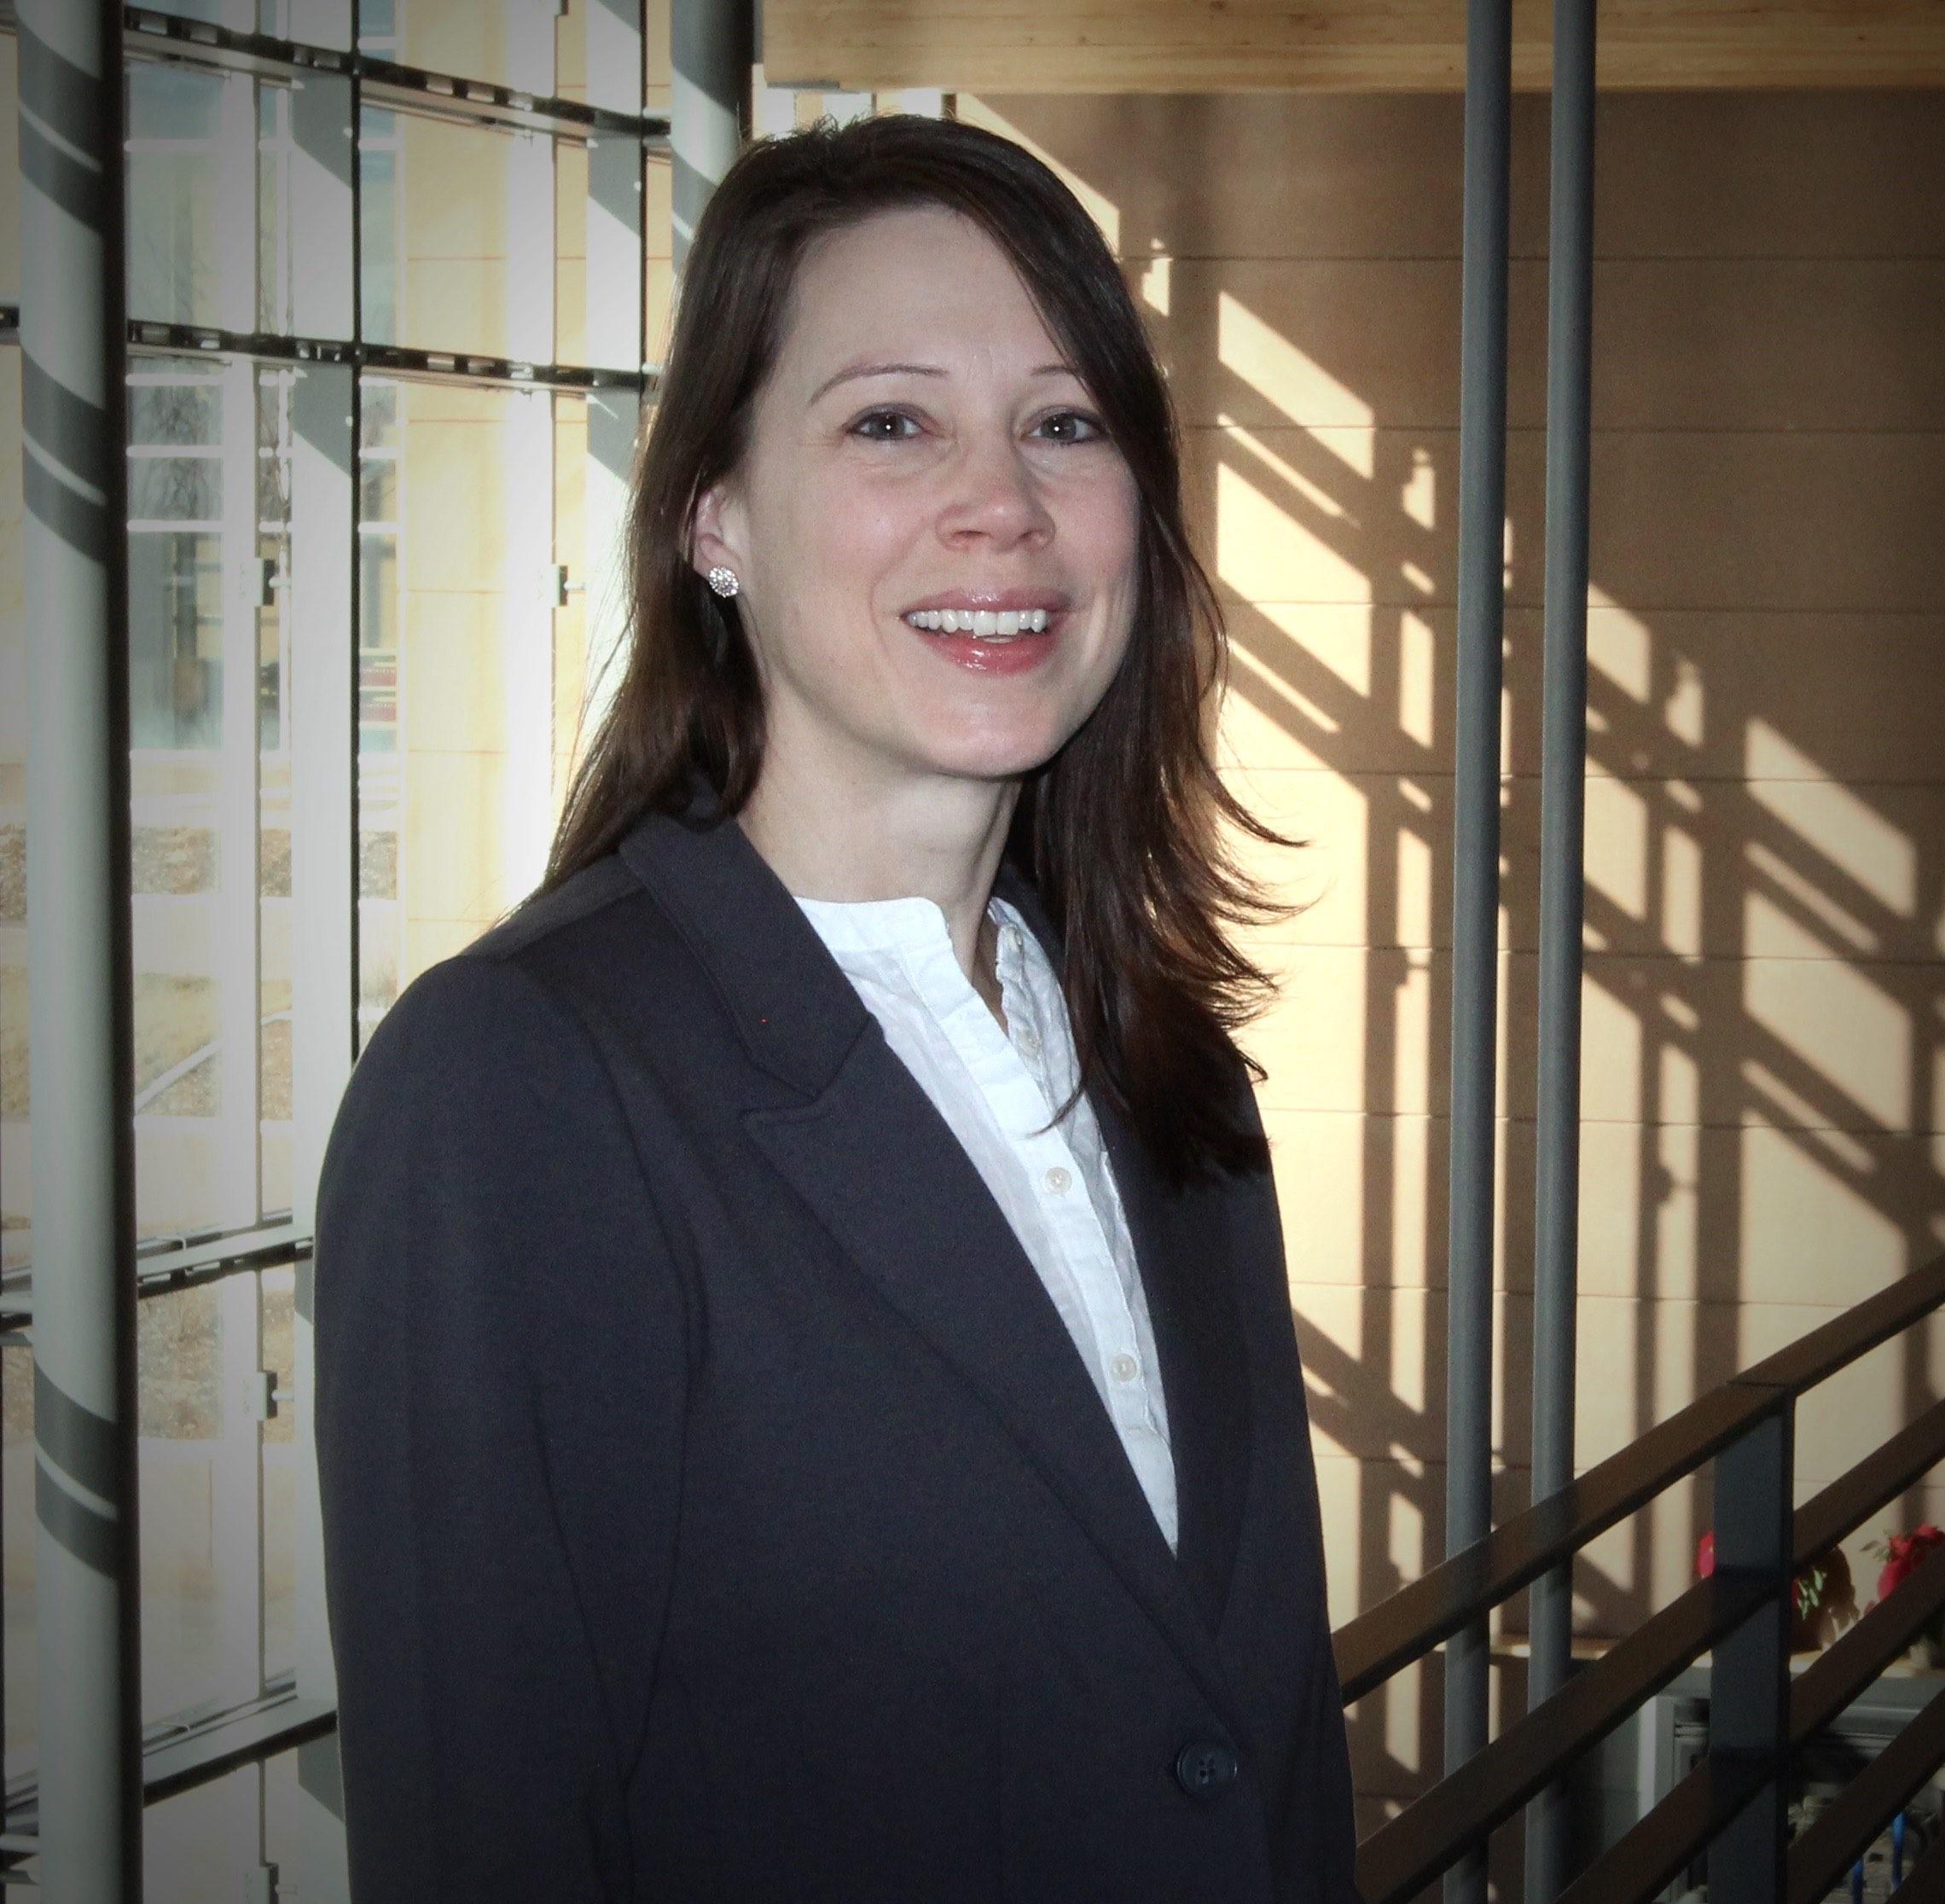 AUTHOR:  Shauna Batcheller, Owner, Nestability